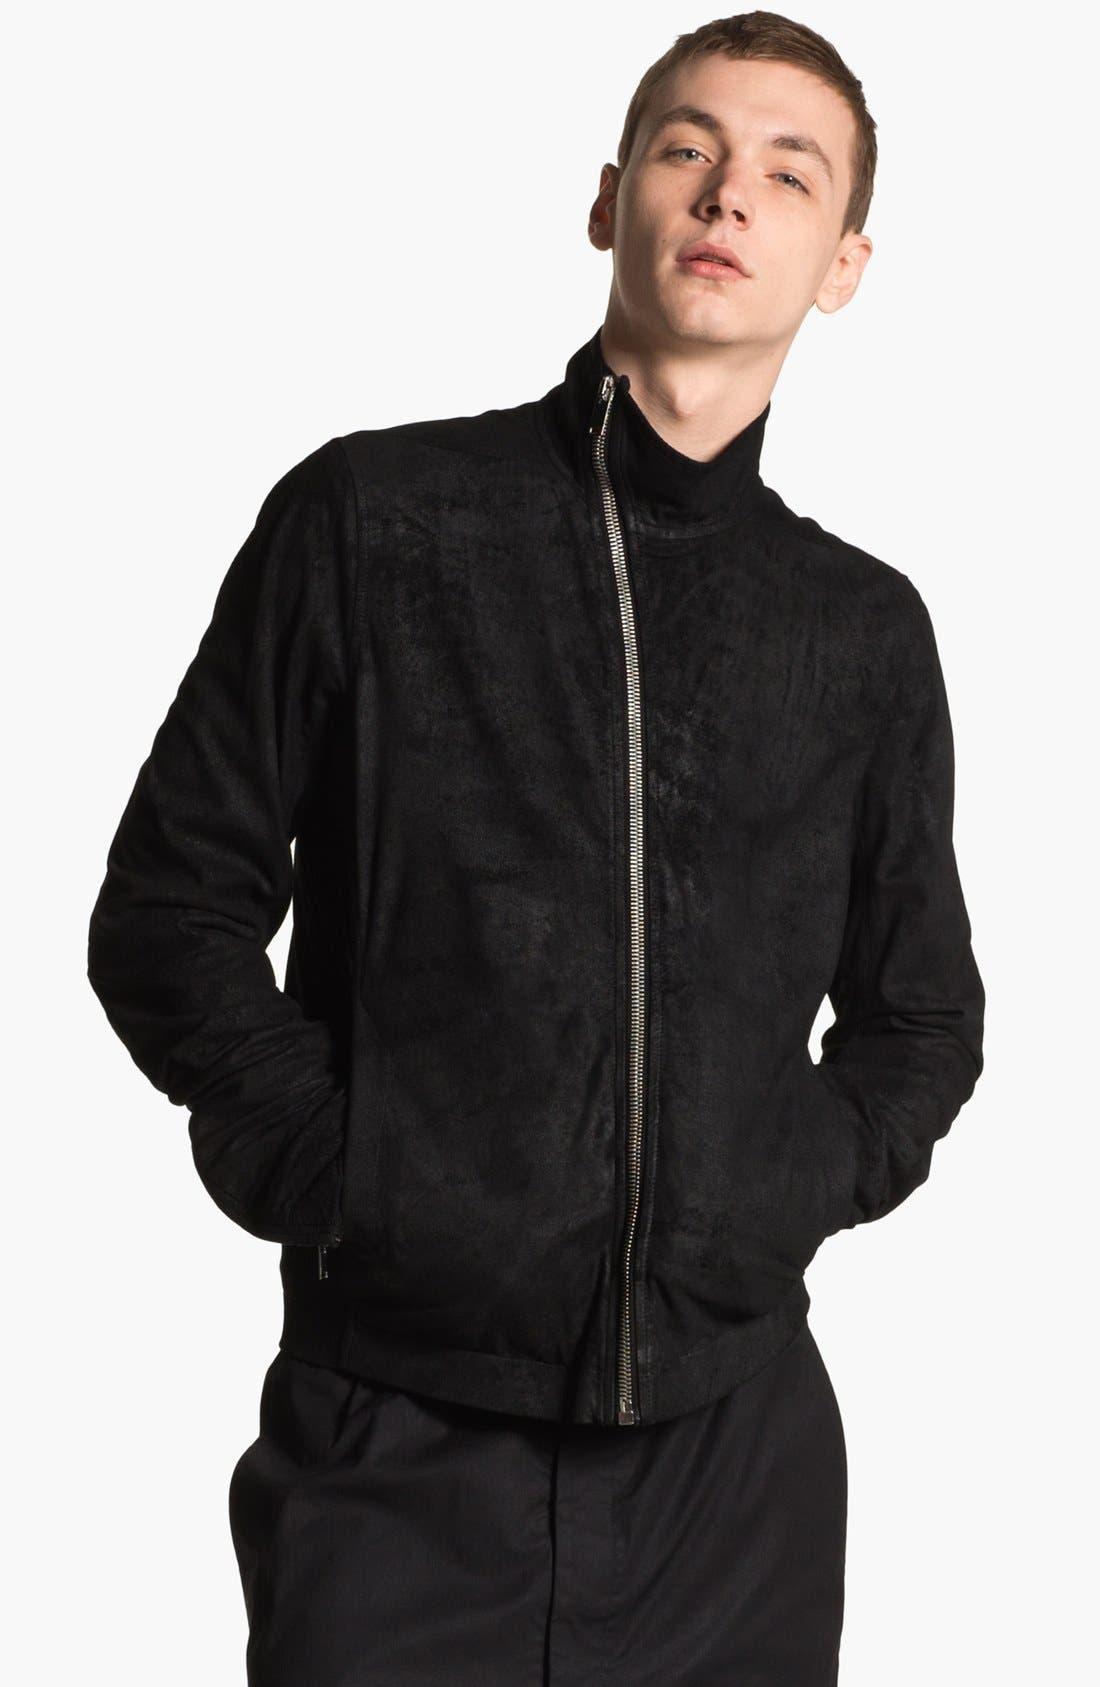 Main Image - Rick Owens 'Mollino' Lambskin Leather Jacket